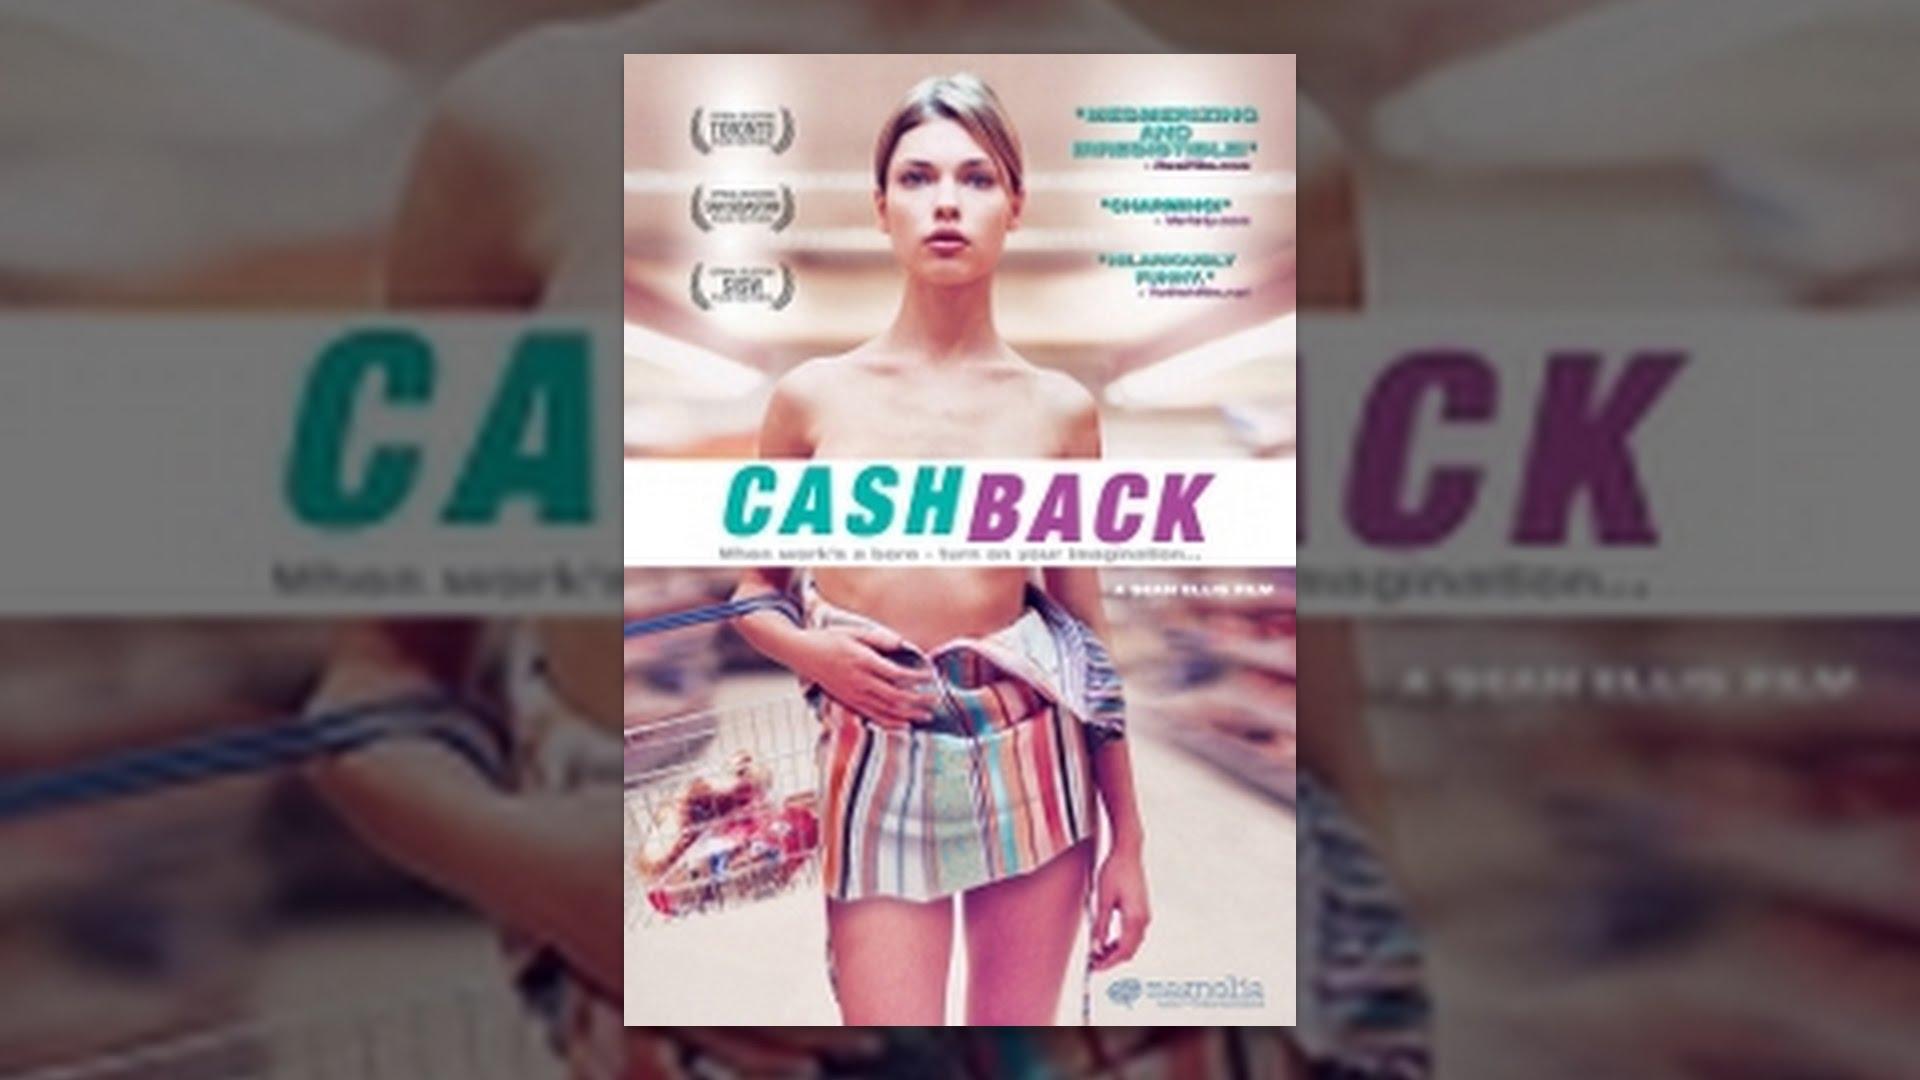 Cahback